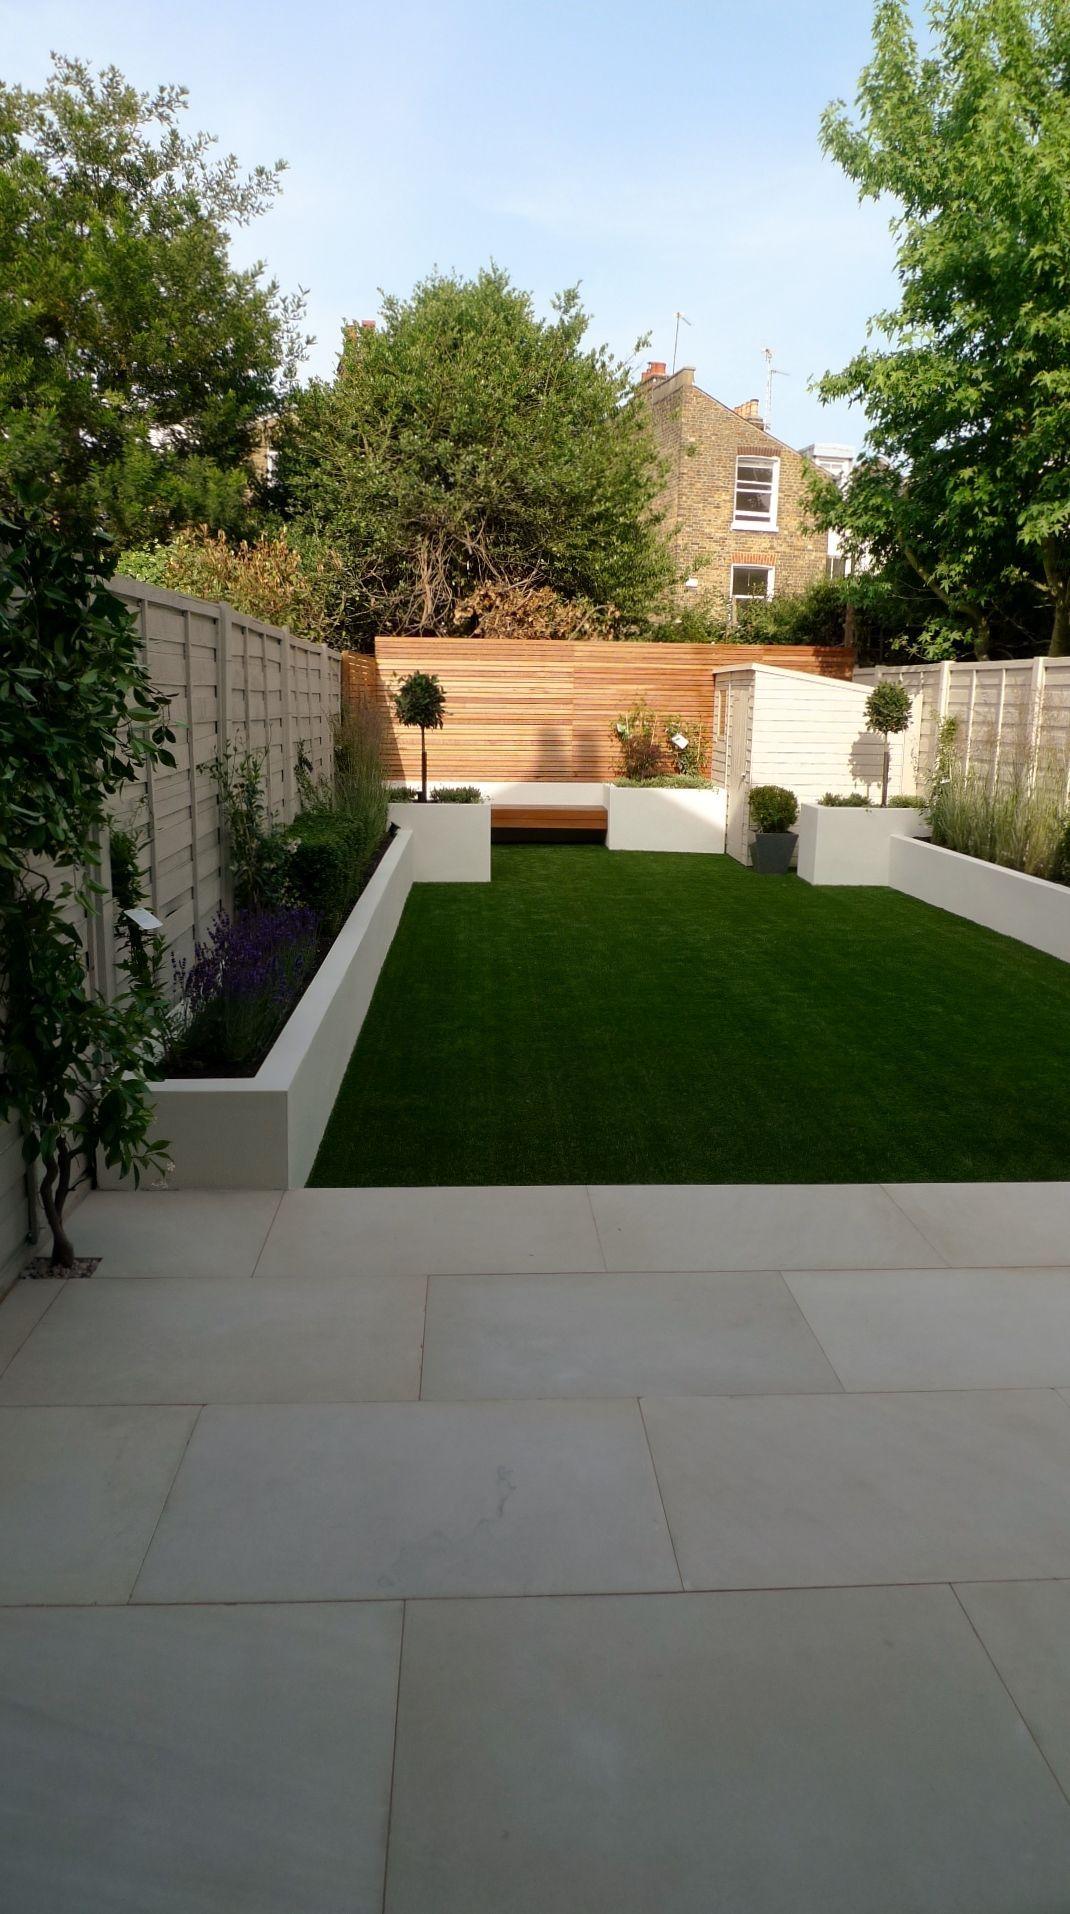 10 Pinterest Gardens Ideas Most Amazing As Well As Attractive Back Garden Design Courtyard Gardens Design Minimalist Garden